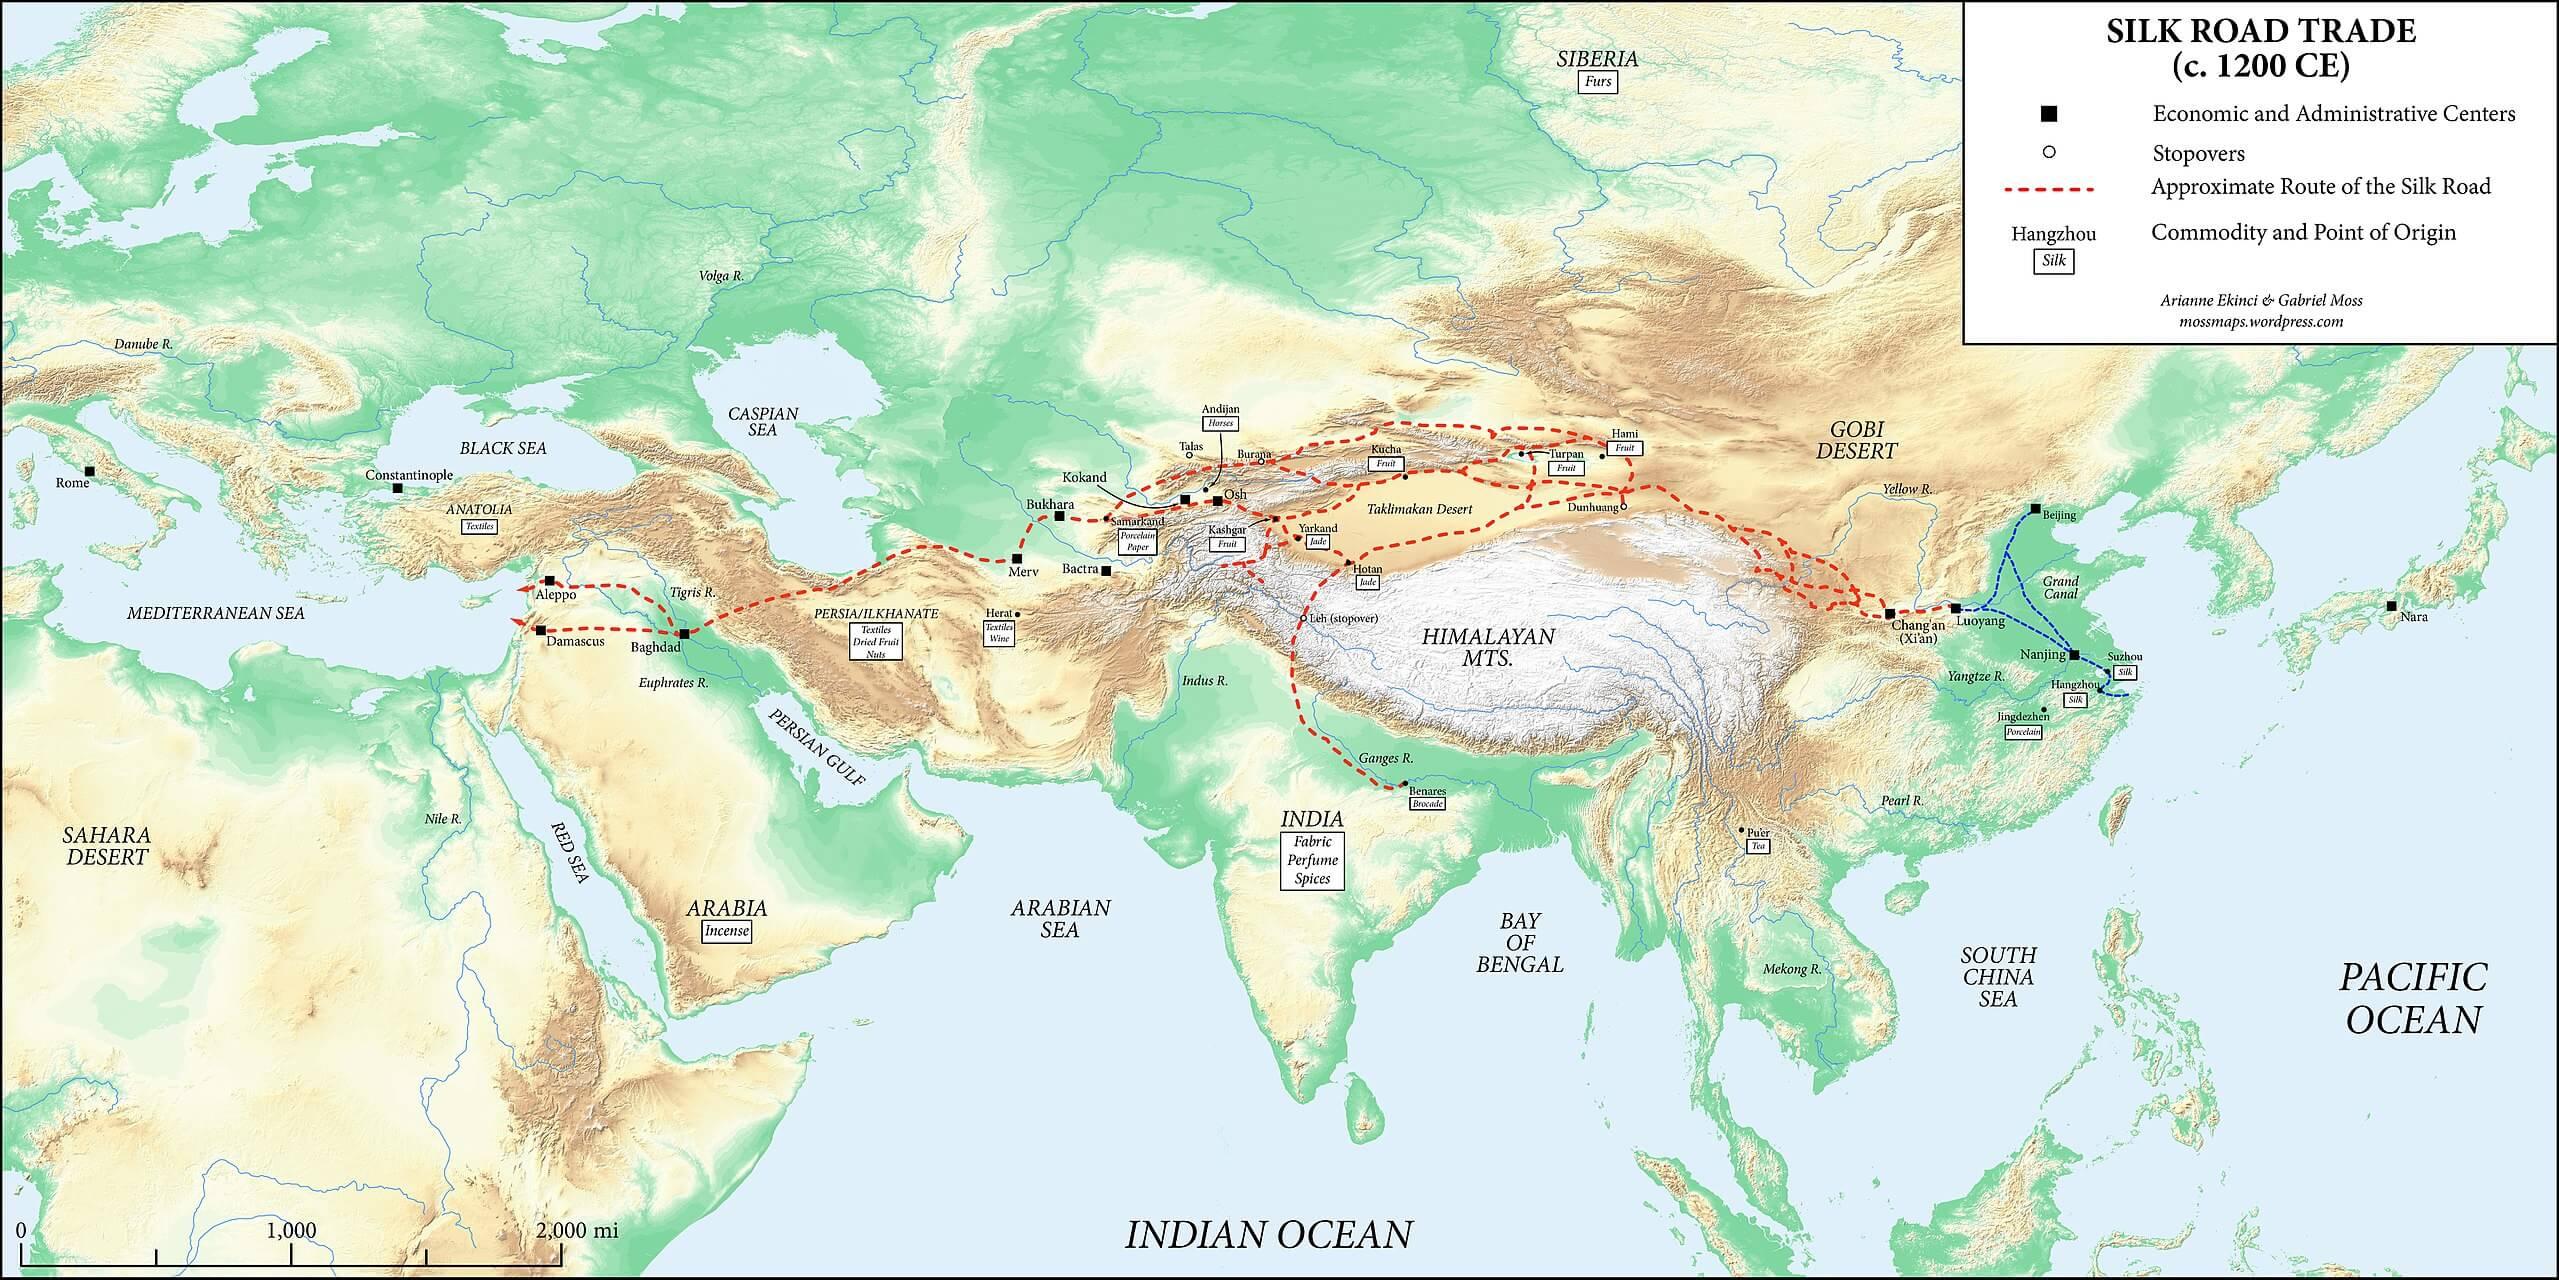 A map od the Silk Road circa 1200 CE.